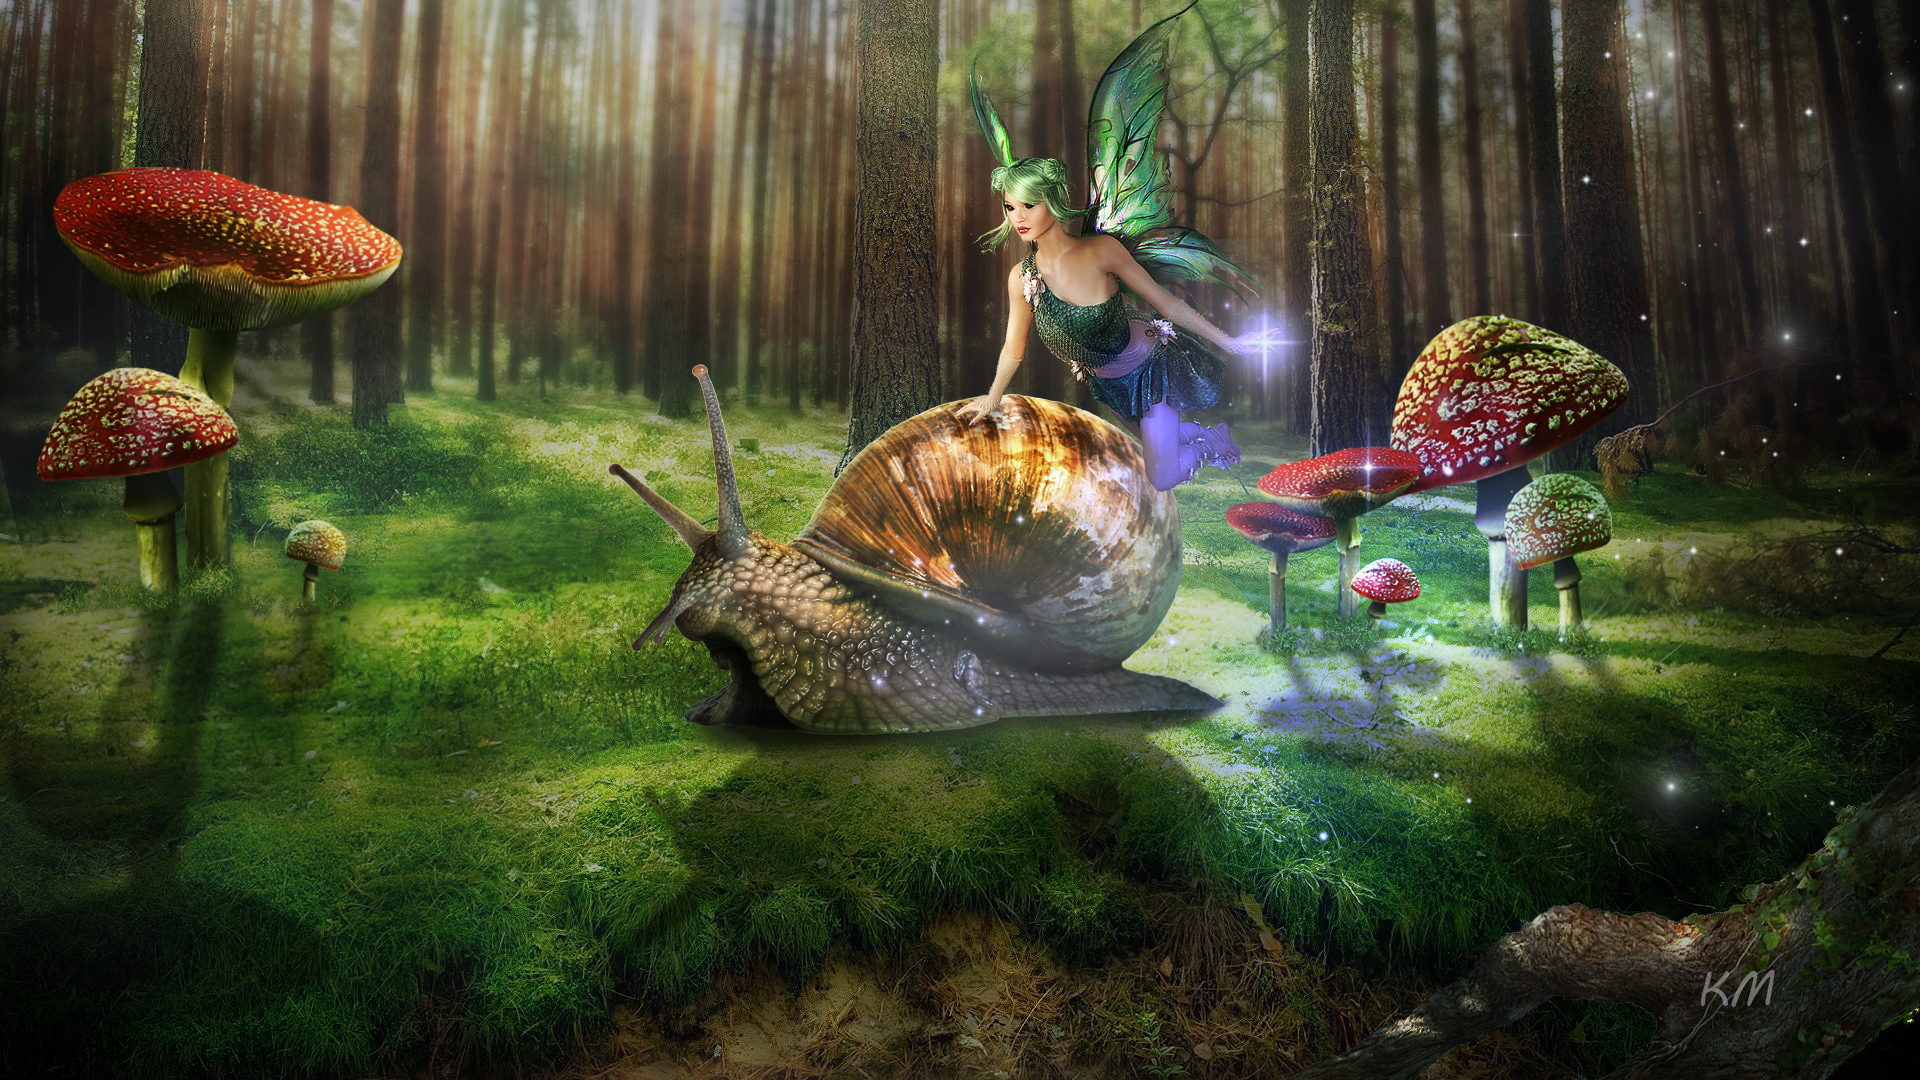 Fairy Mushroom Snail 1920x1080